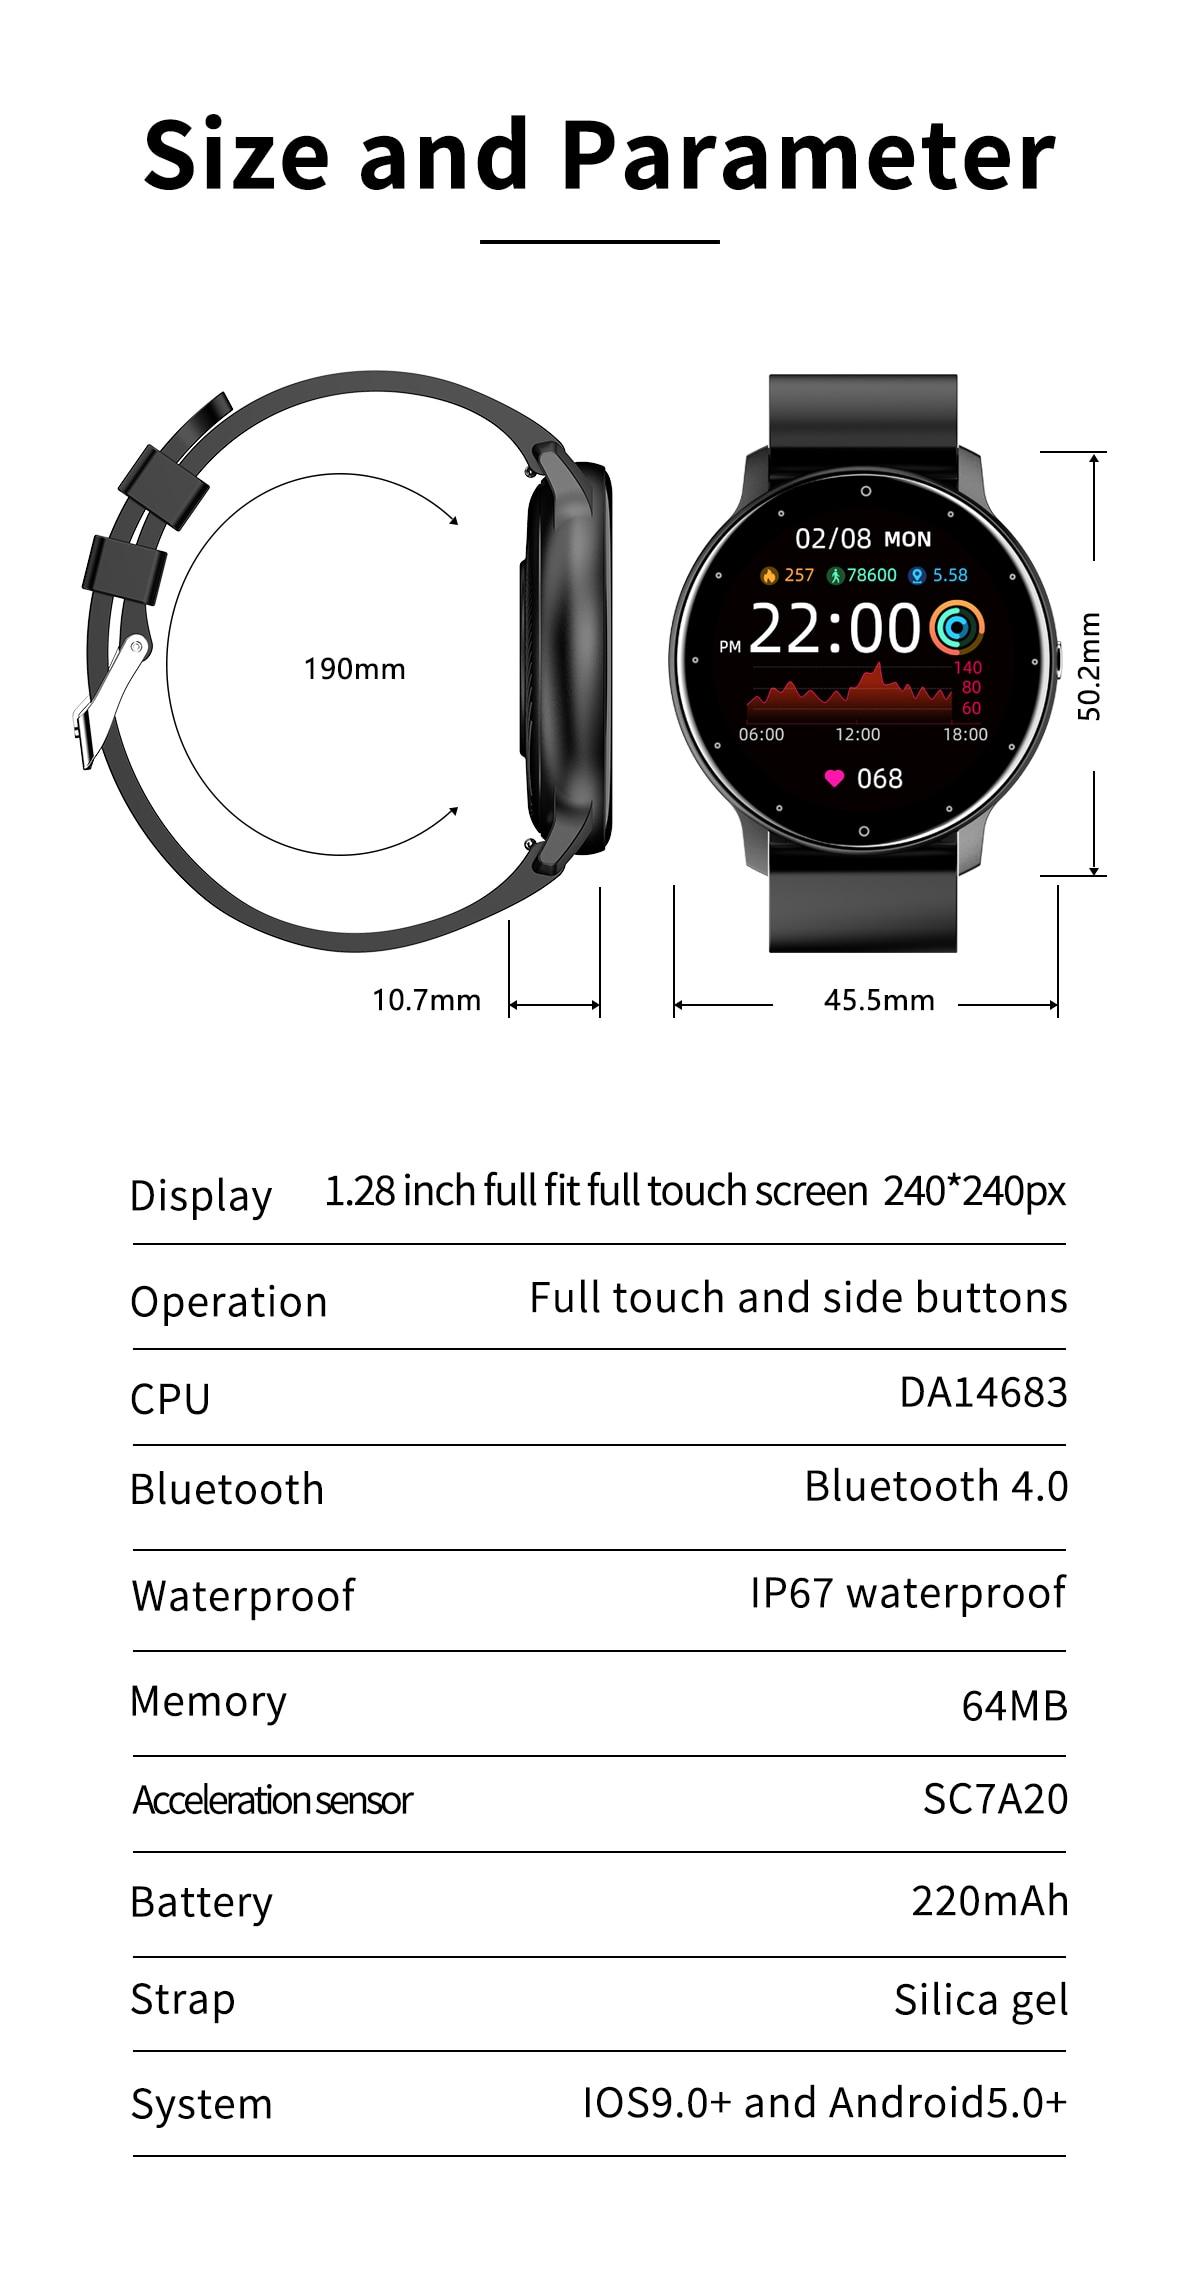 H40bf2e2aada048489ff95b6403aa36a77 LIGE 2021 Fashion Smart Watch Men Fitness Bracelet Heart Rate Blood Pressure Monitoring Sports Tracker Smartwatch Gift for Women